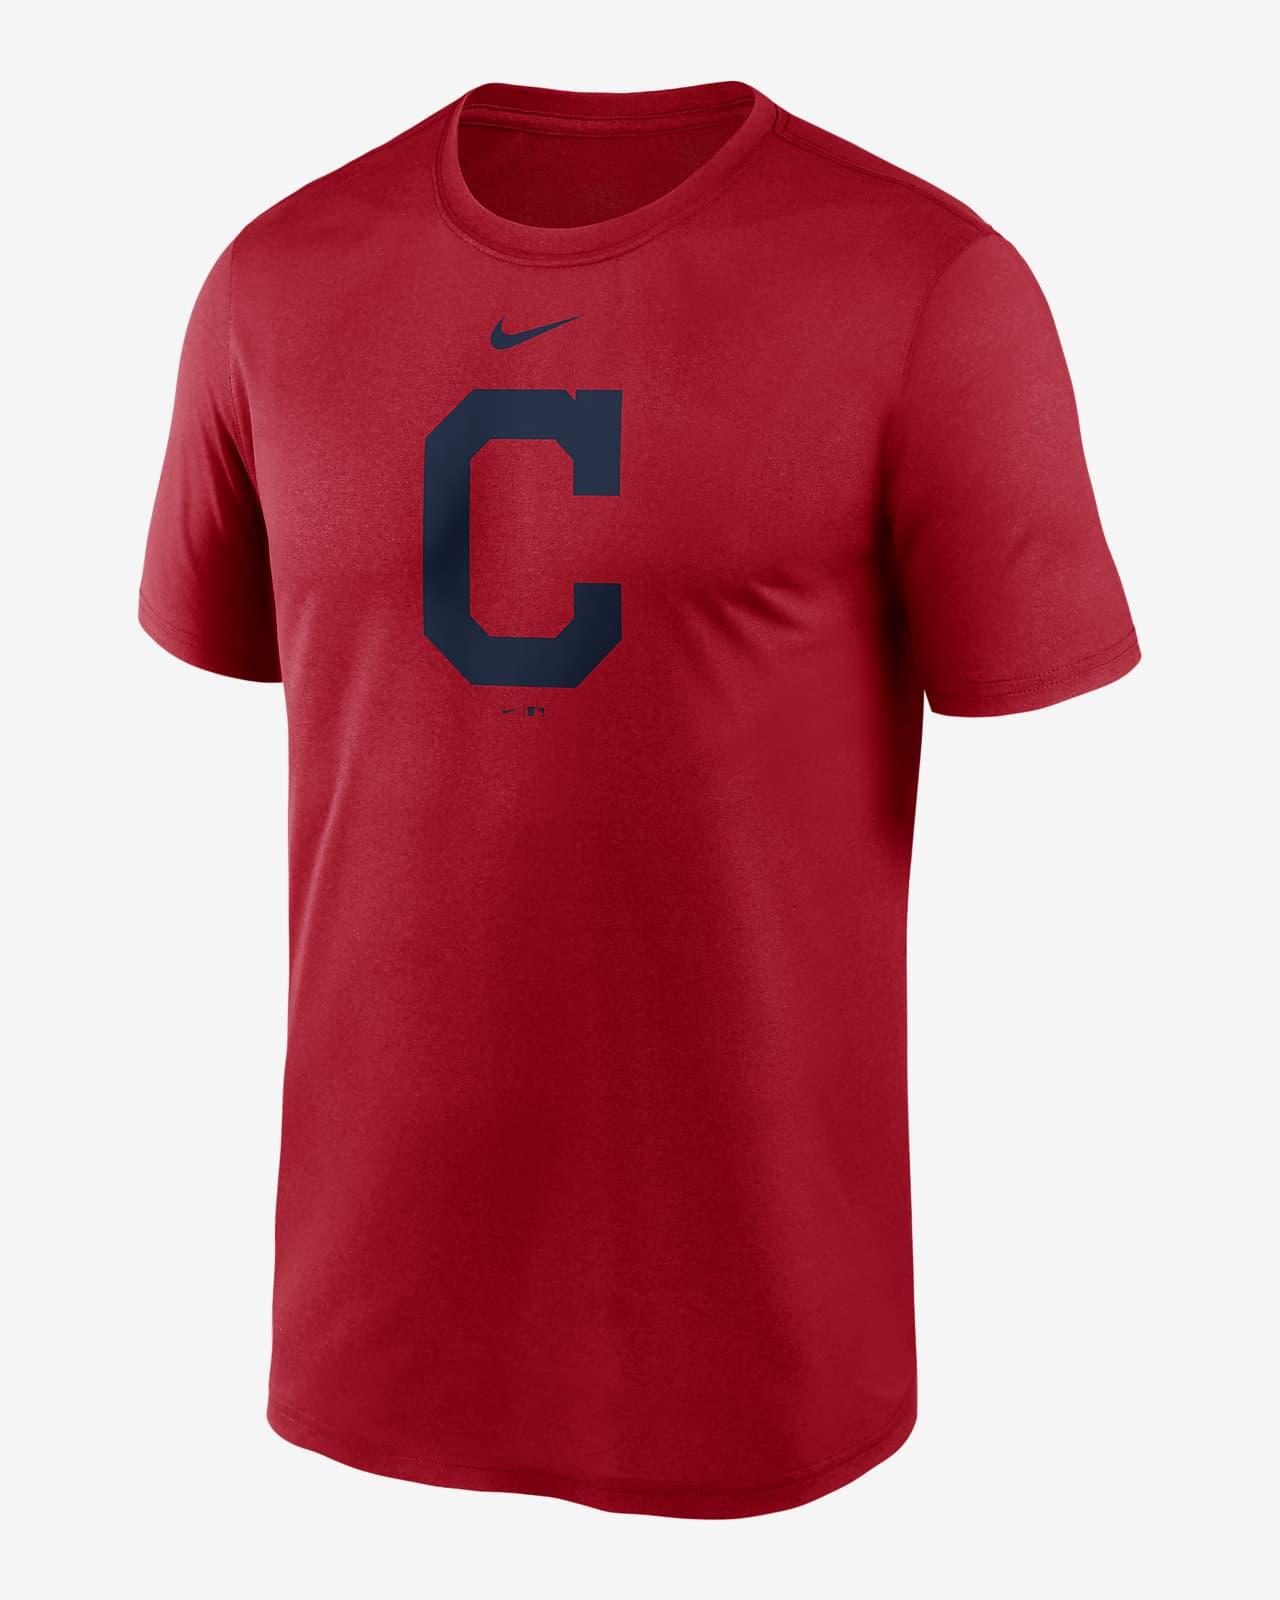 Nike Dri-FIT Logo Legend (MLB Cleveland) Men's T-Shirt